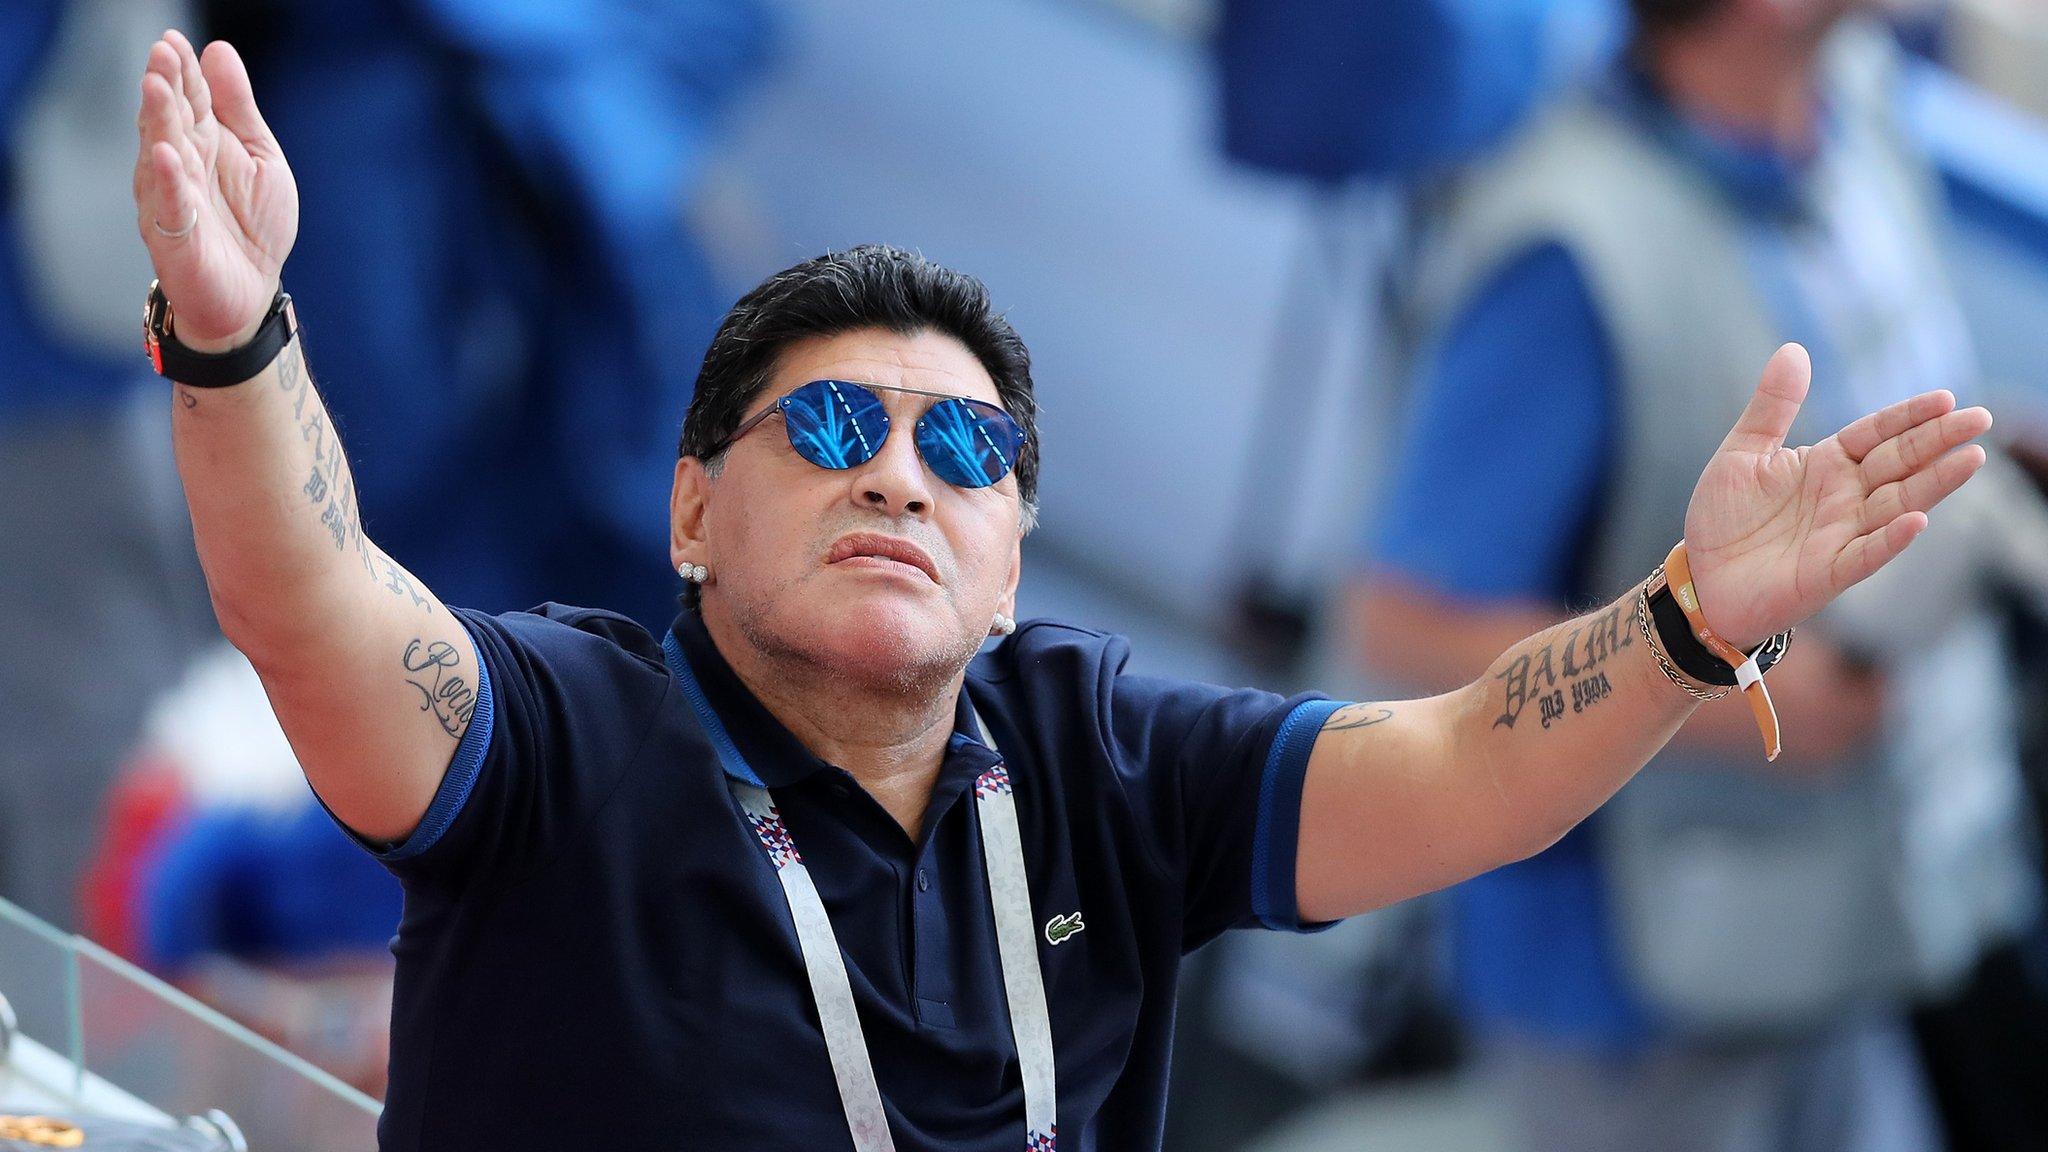 Maradona apologises for saying England 'robbed' Colombia